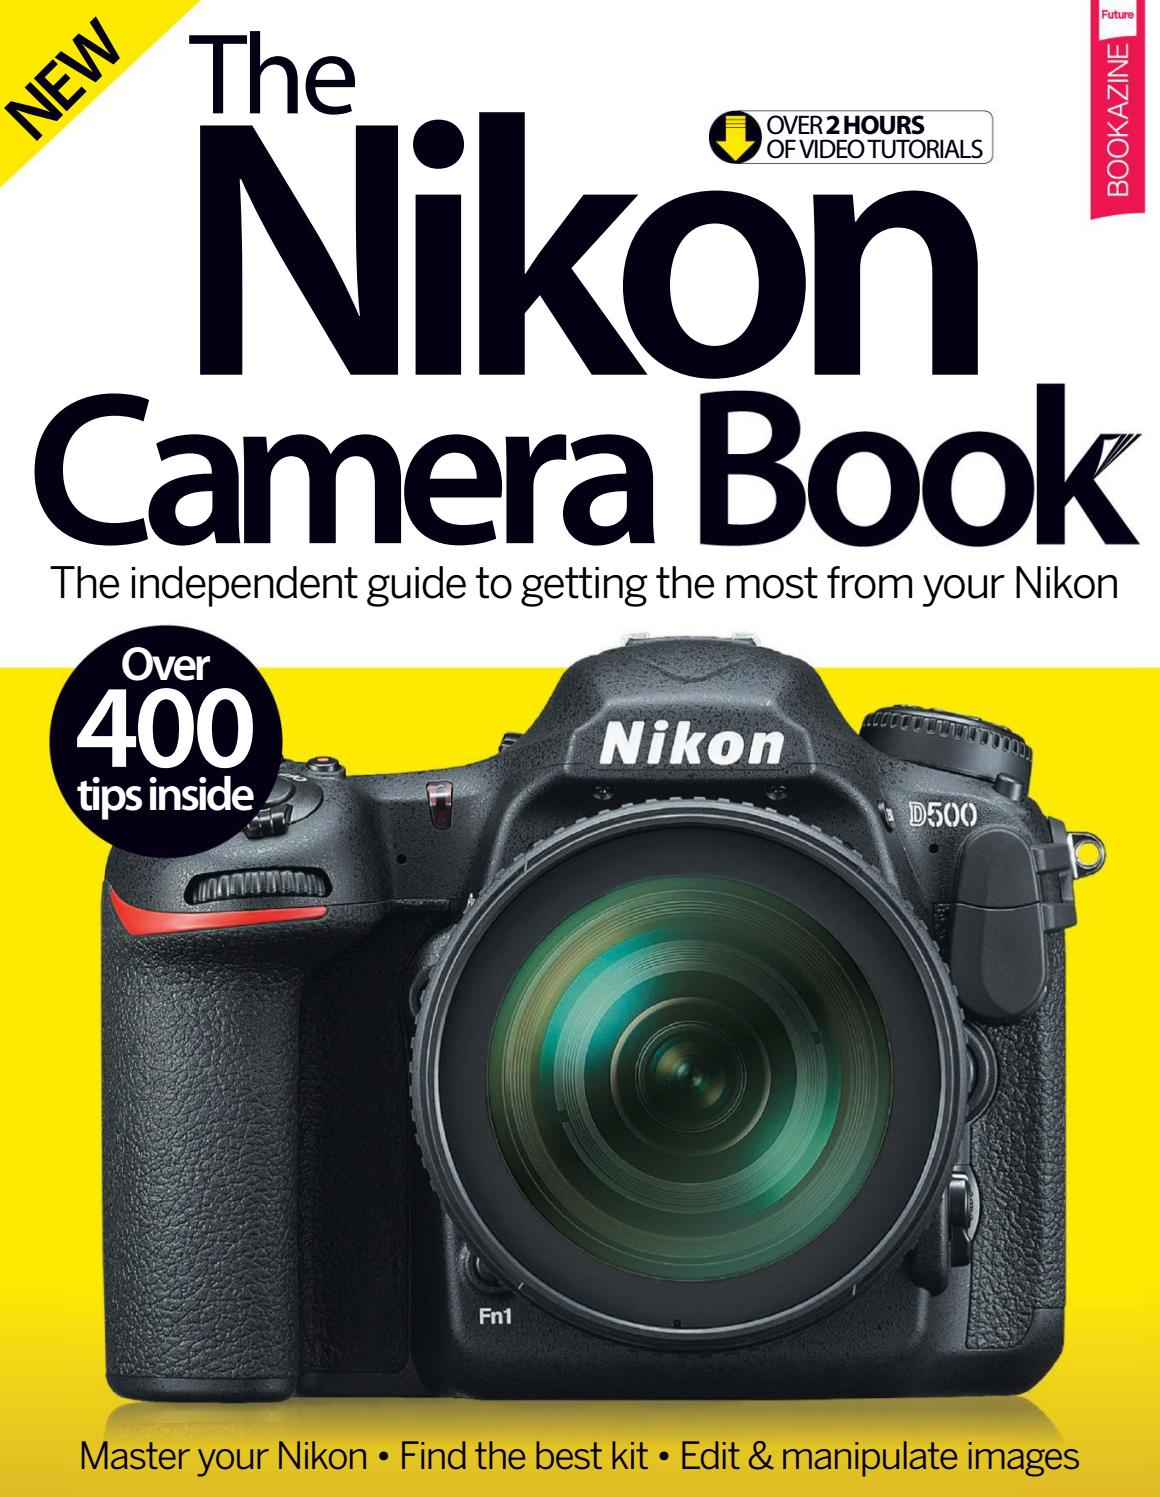 Lens 62mm Nikon 1 J4 10x High Definition 2 Element Close-Up Macro